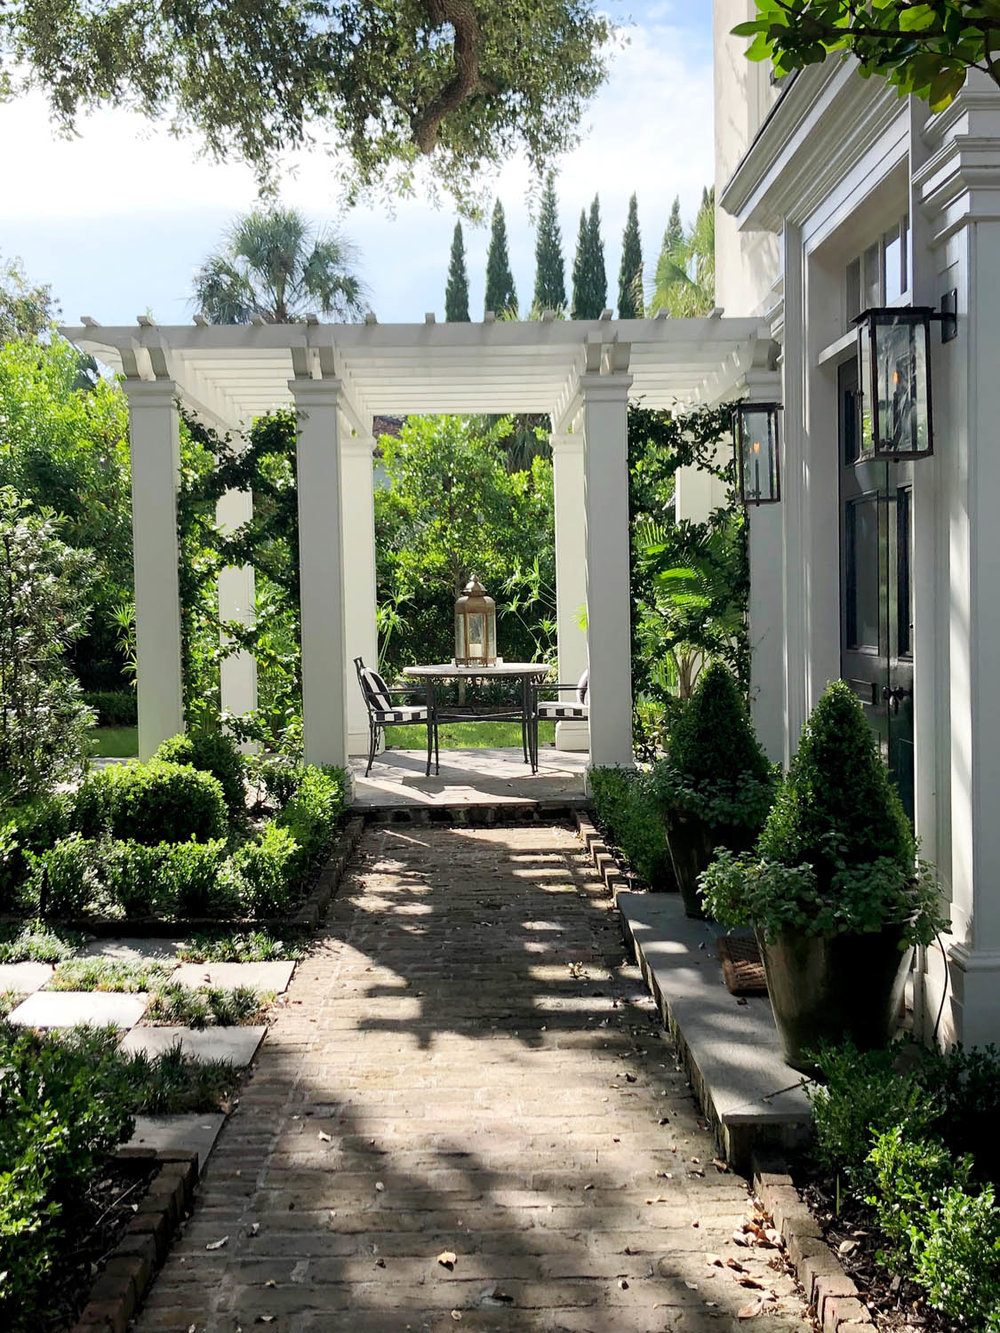 beautiful patio with white pillars